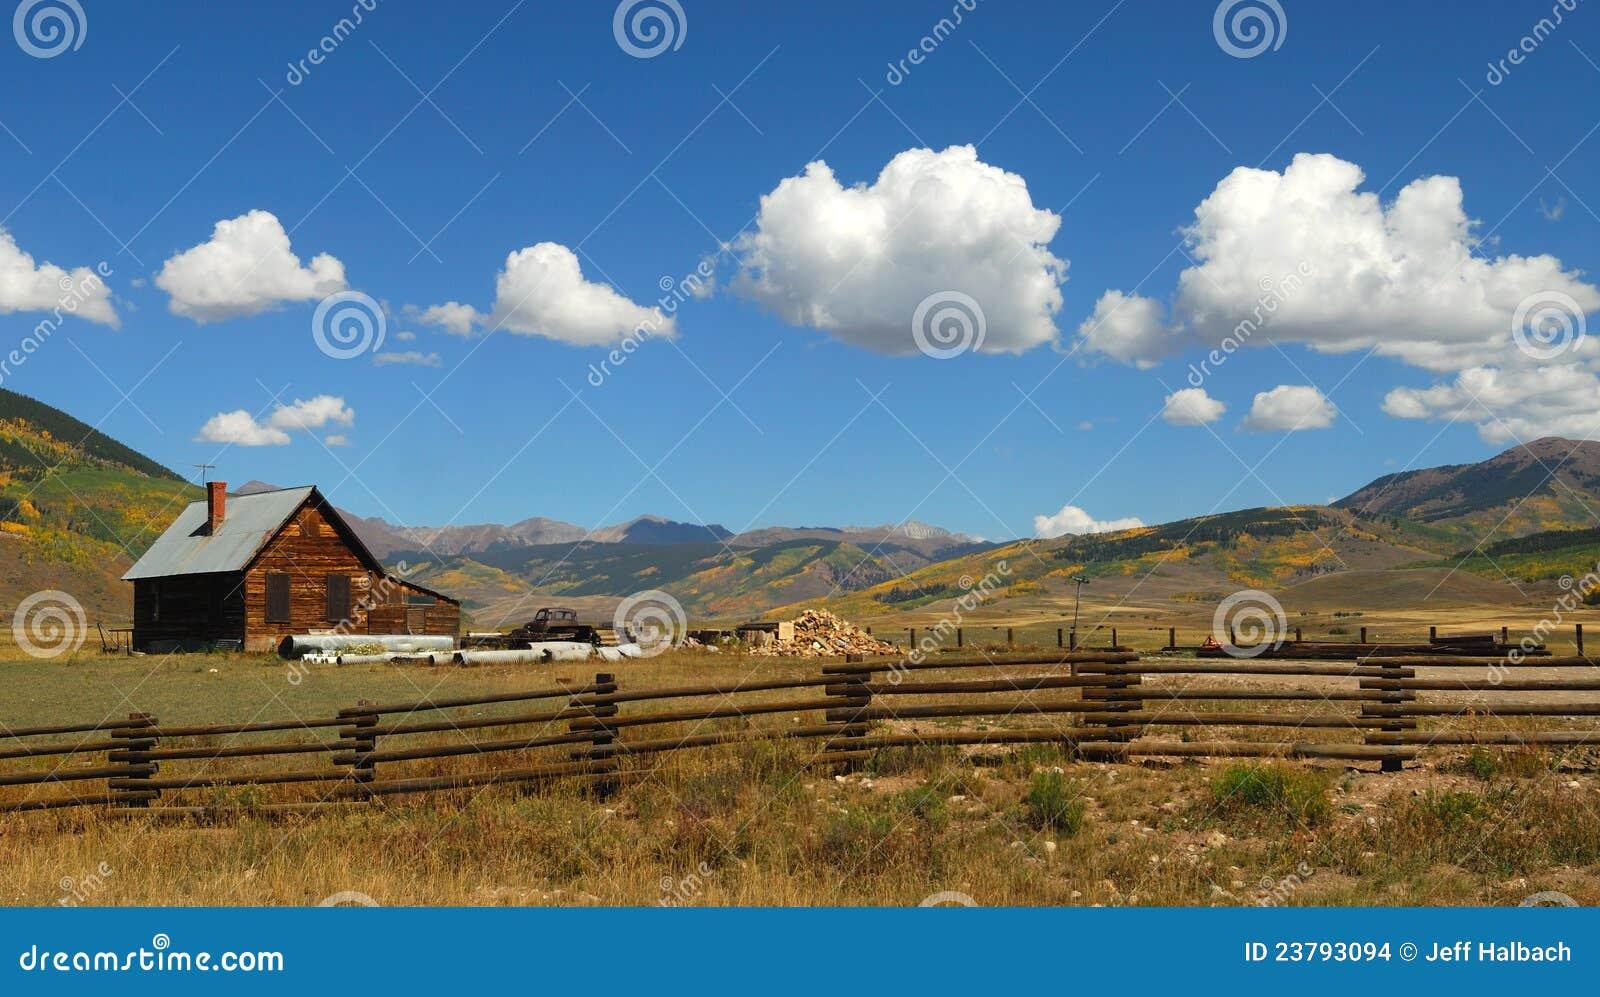 Western Log Cabin Stock Images Image 23793094